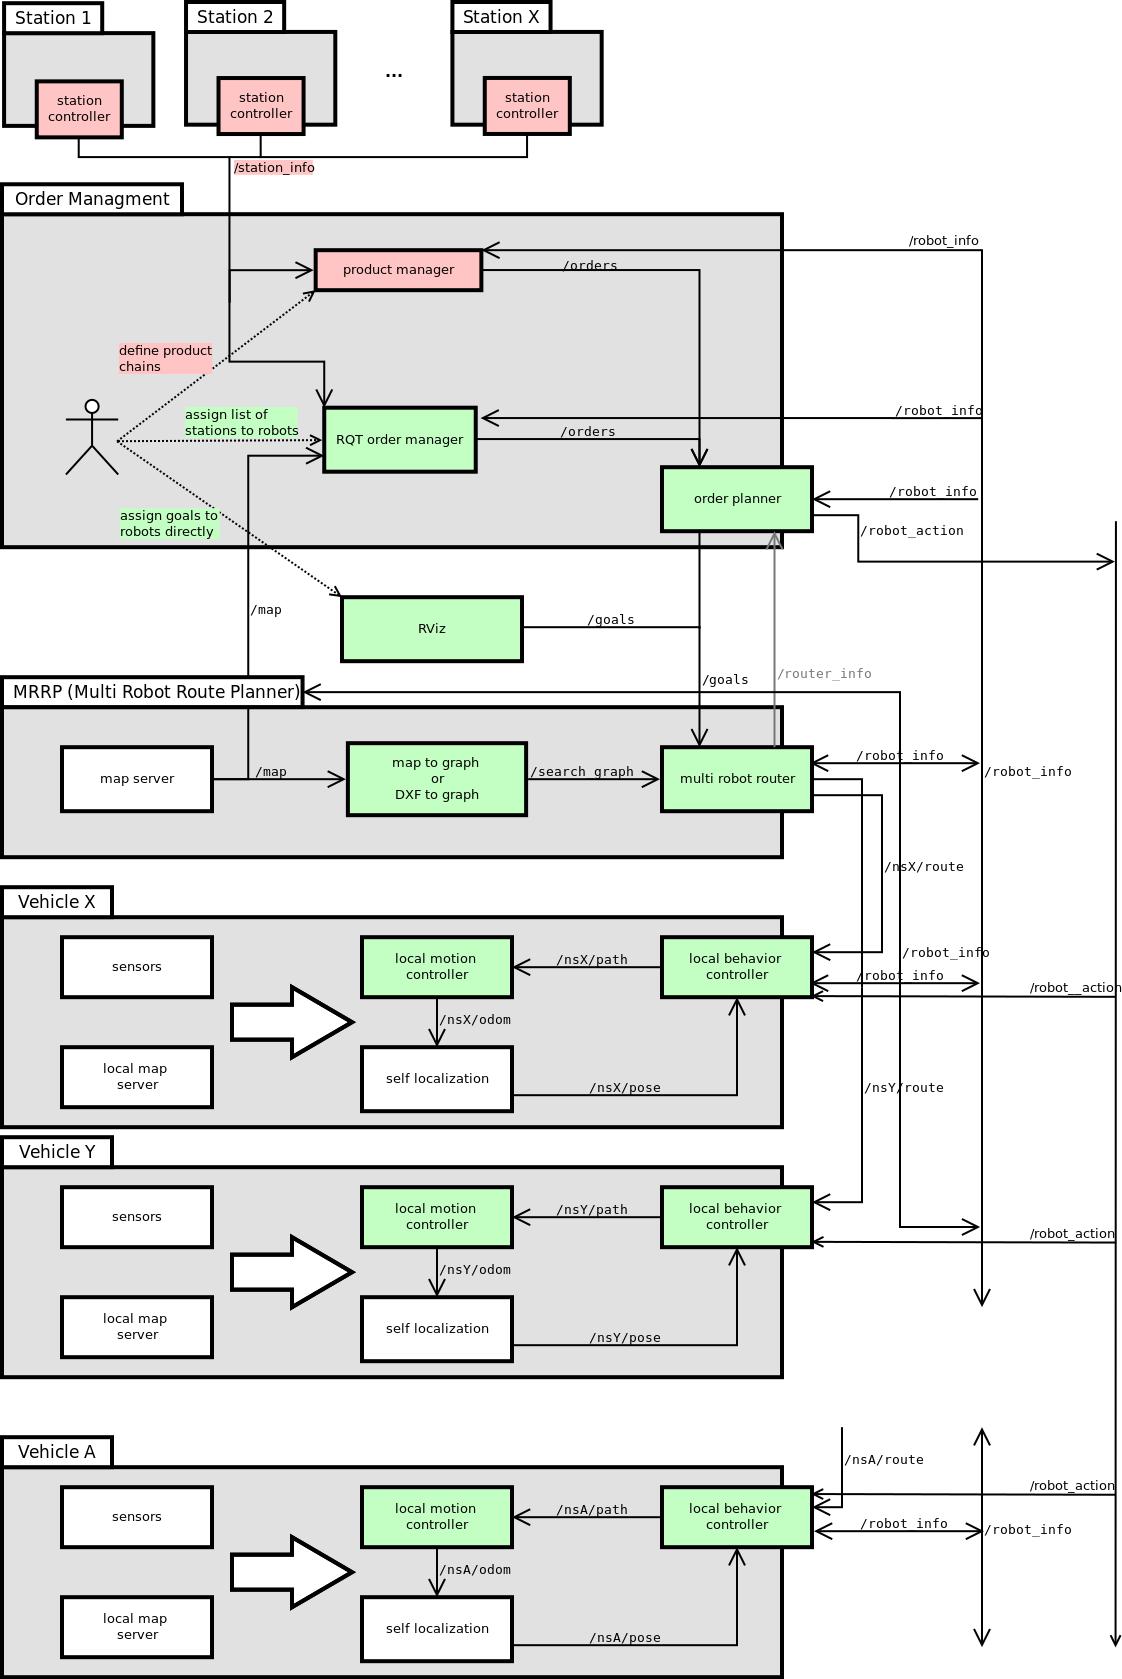 https://github.com/tuw-robotics/tuw_multi_robot/raw/master/tuw_multi_robot/res/dataflow.png